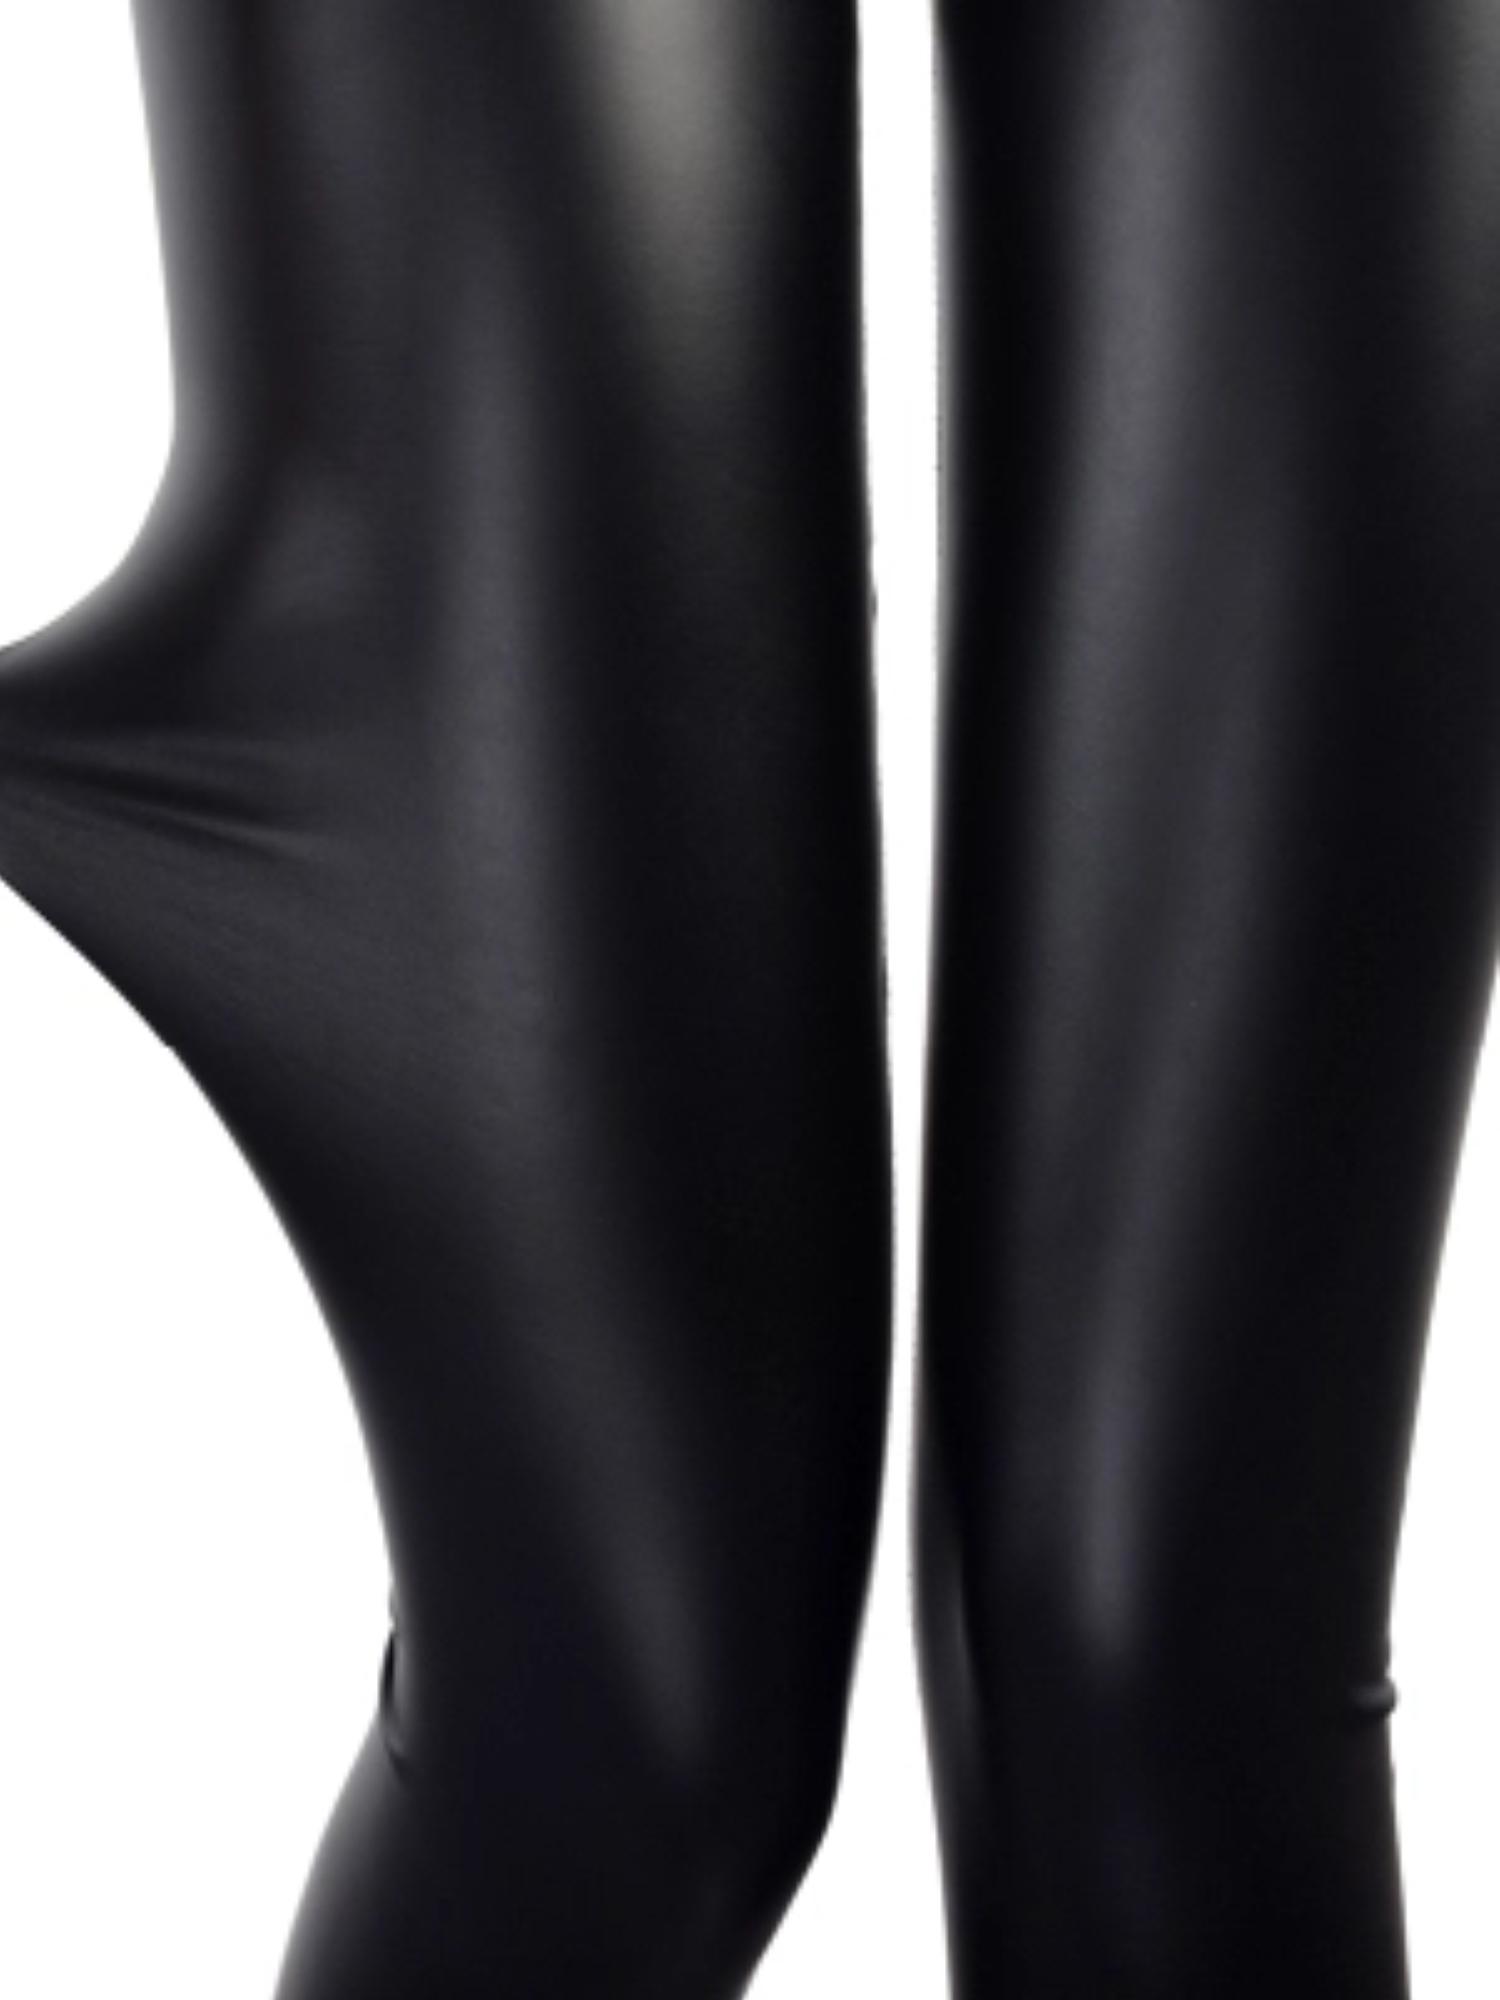 24a56f0e7 SAYFUT - SAYFUT Women Girls Faux Leather Leggings Warm Pants Slim Tight  Stretch Velvet Trouser Black S-4XL - Walmart.com